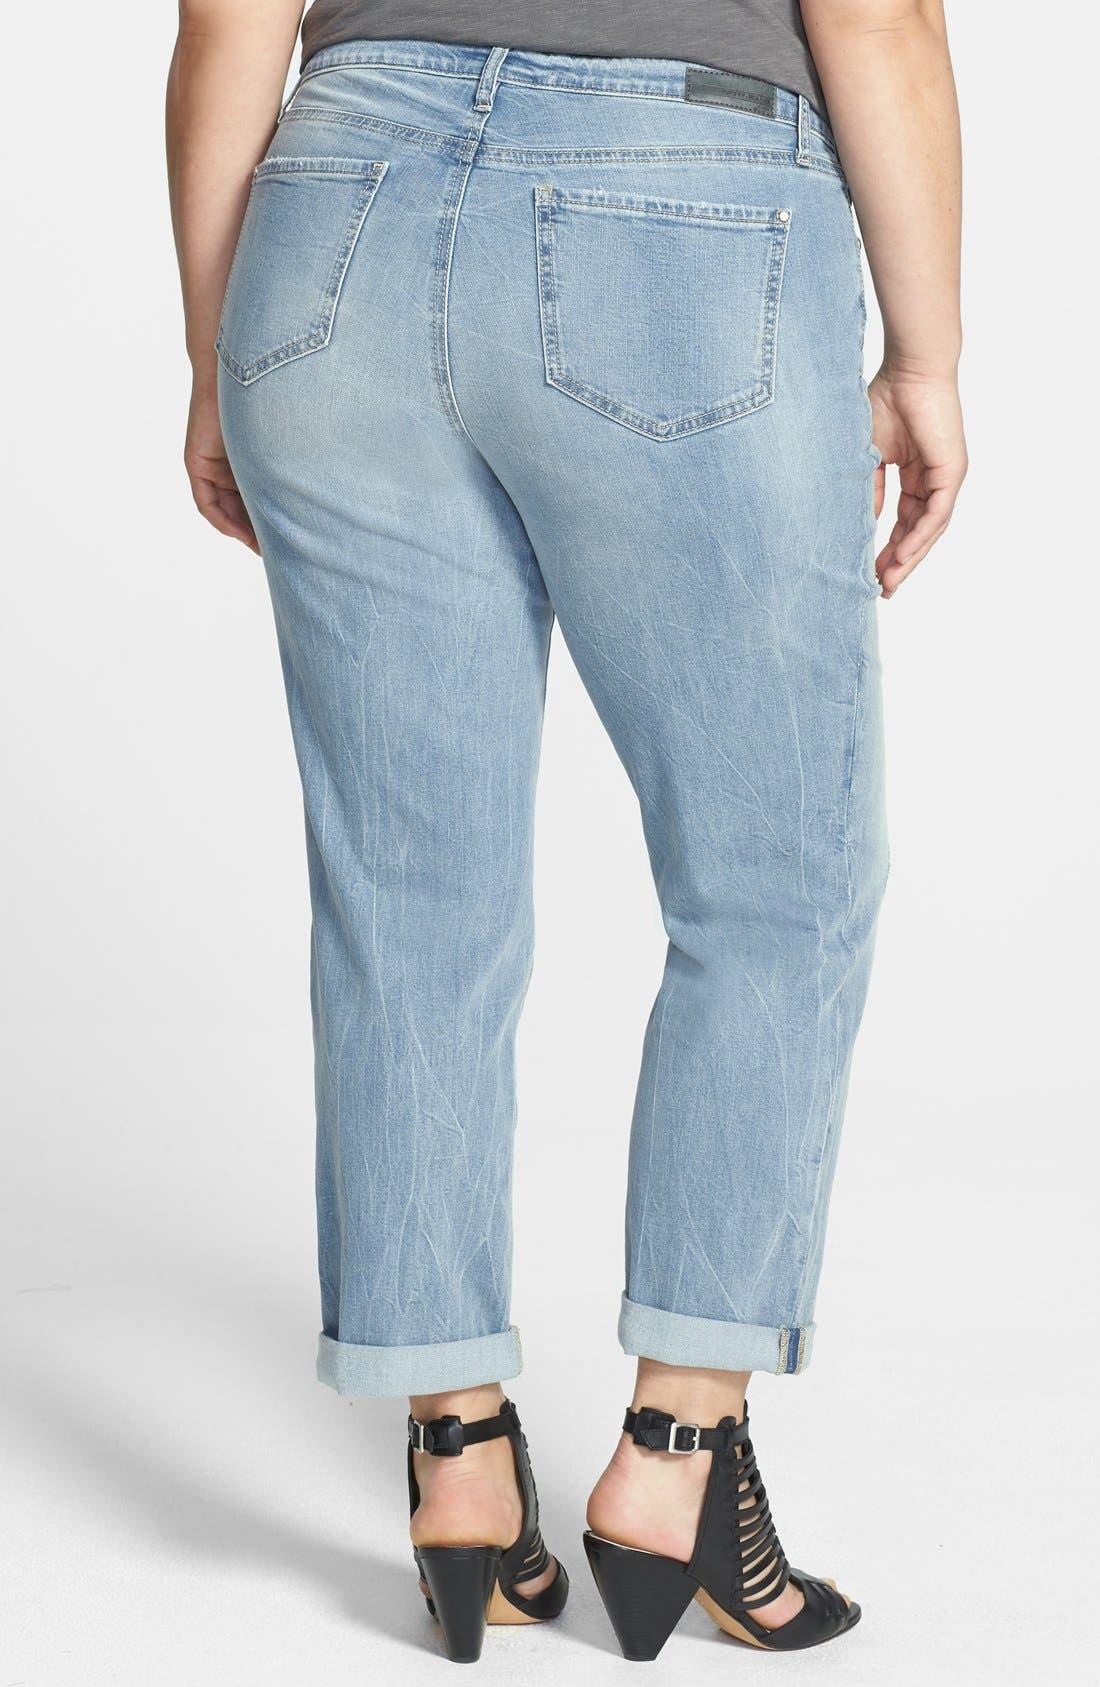 DKNY,                             'Bleecker' Boyfriend Jeans,                             Alternate thumbnail 2, color,                             400